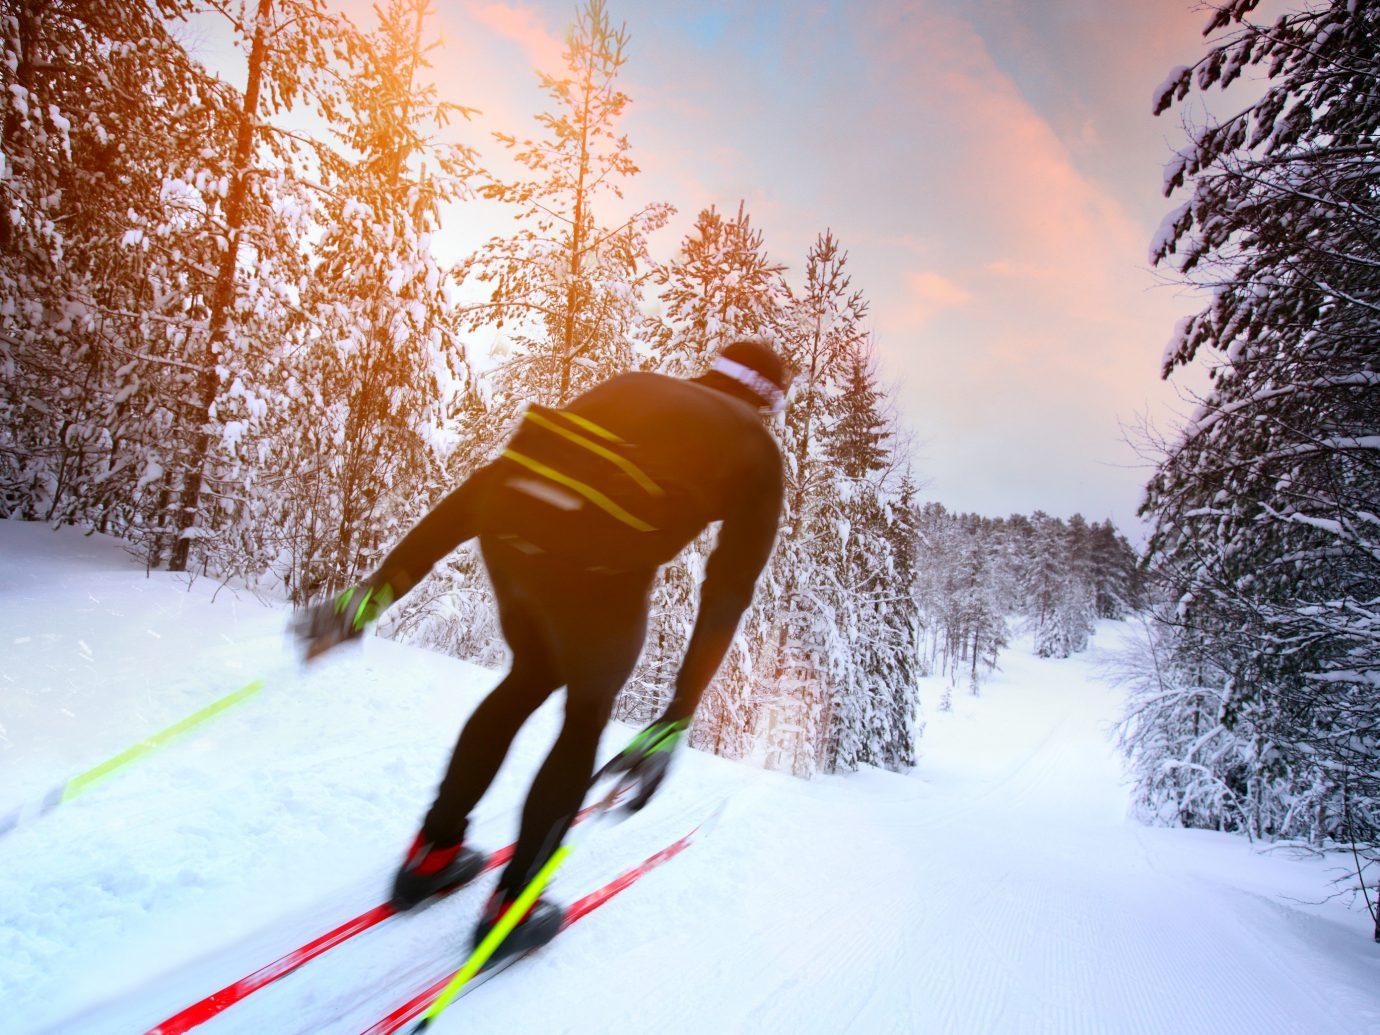 Croatia Eastern Europe europe Montenegro Slovenia Trip Ideas tree outdoor snow person skiing man sports Winter cross country skiing footwear season winter sport outdoor recreation recreation nordic skiing